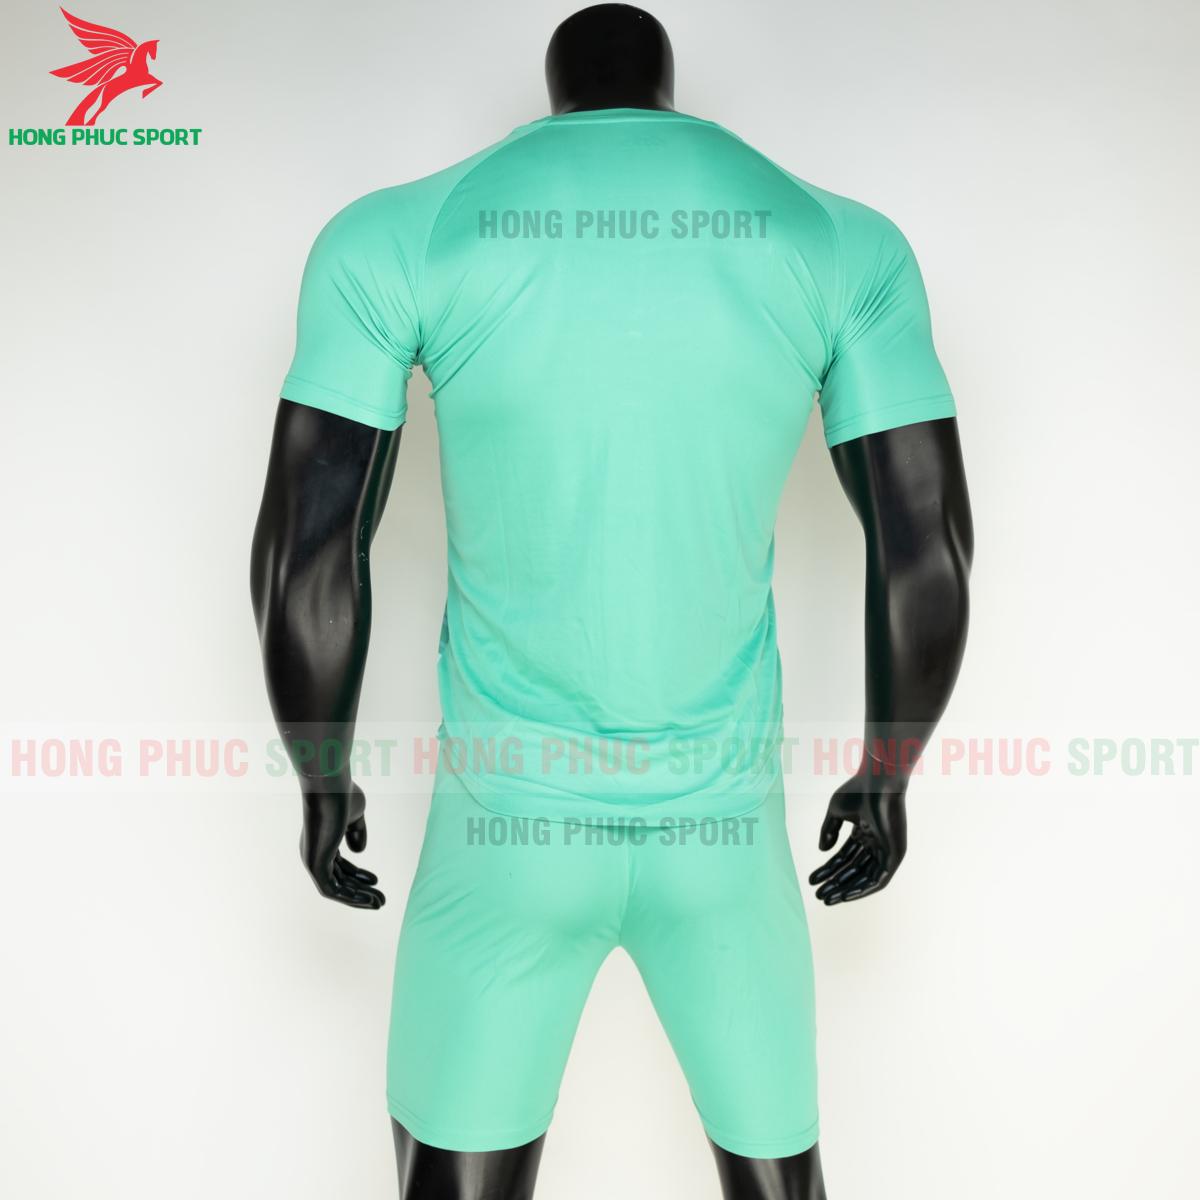 https://cdn.hongphucsport.com/unsafe/s4.shopbay.vn/files/285/ao-da-bong-barcelona-2020-2021-phien-ban-fan-7-5fe1a458bd90e.png